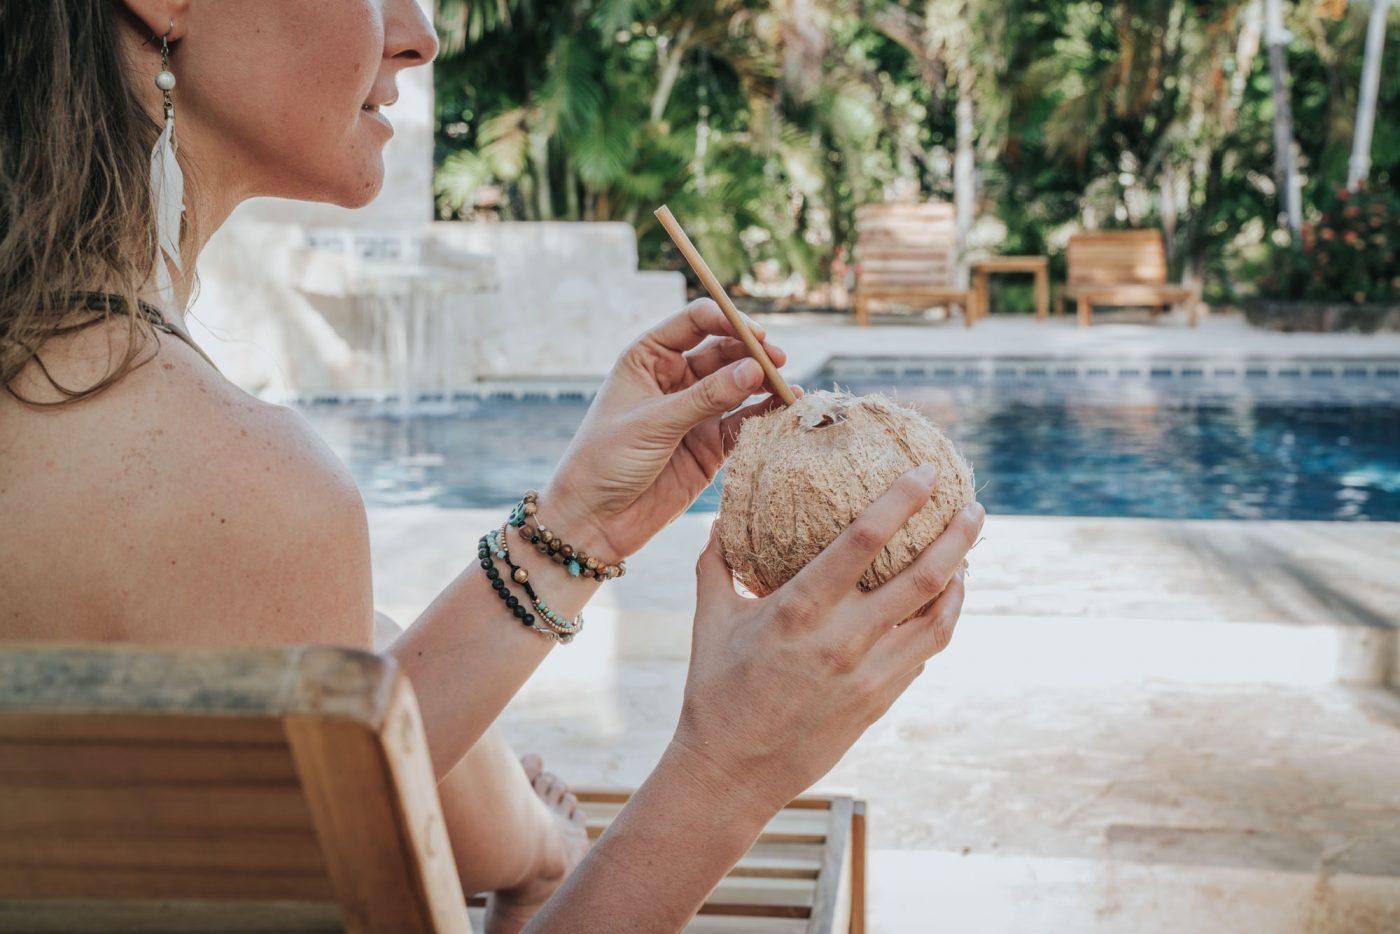 Drift Away Eco Lodge in Costa Rica, Hotels in Tamarindo Costa Rica